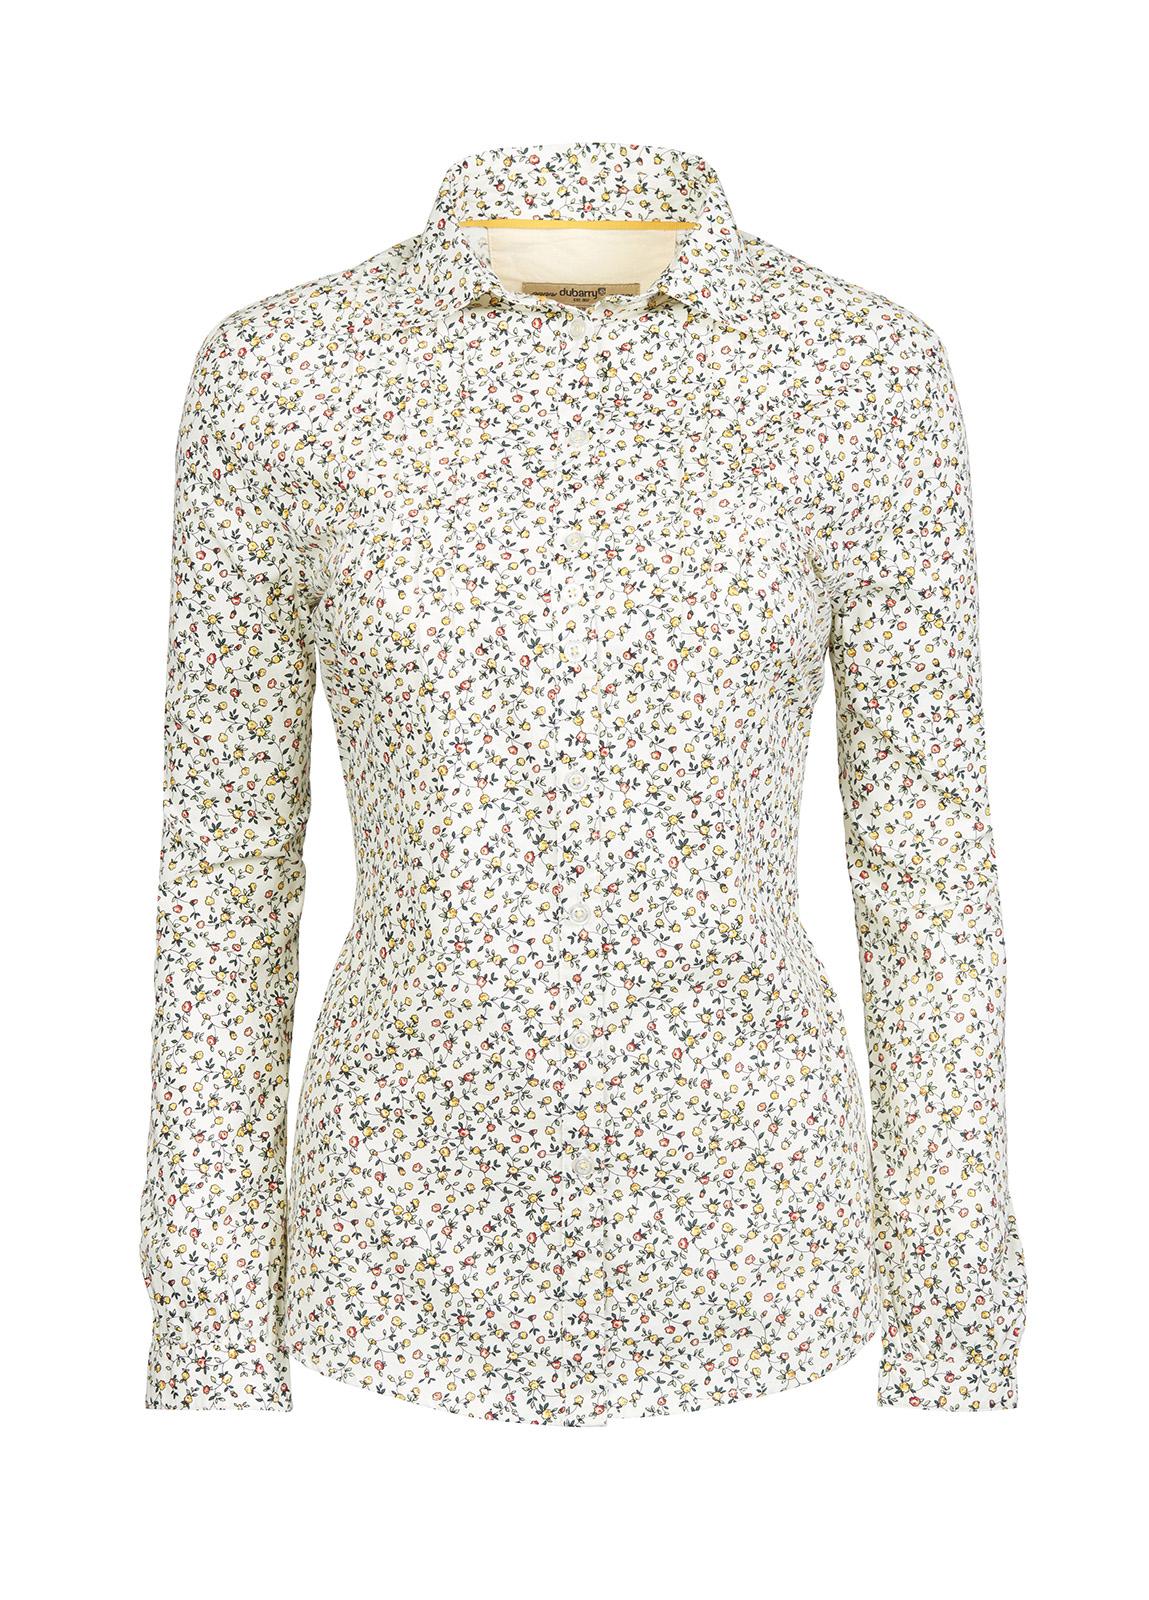 Dubarry_ Brooklime Ladies Shirt - Royal Blue_Image_2